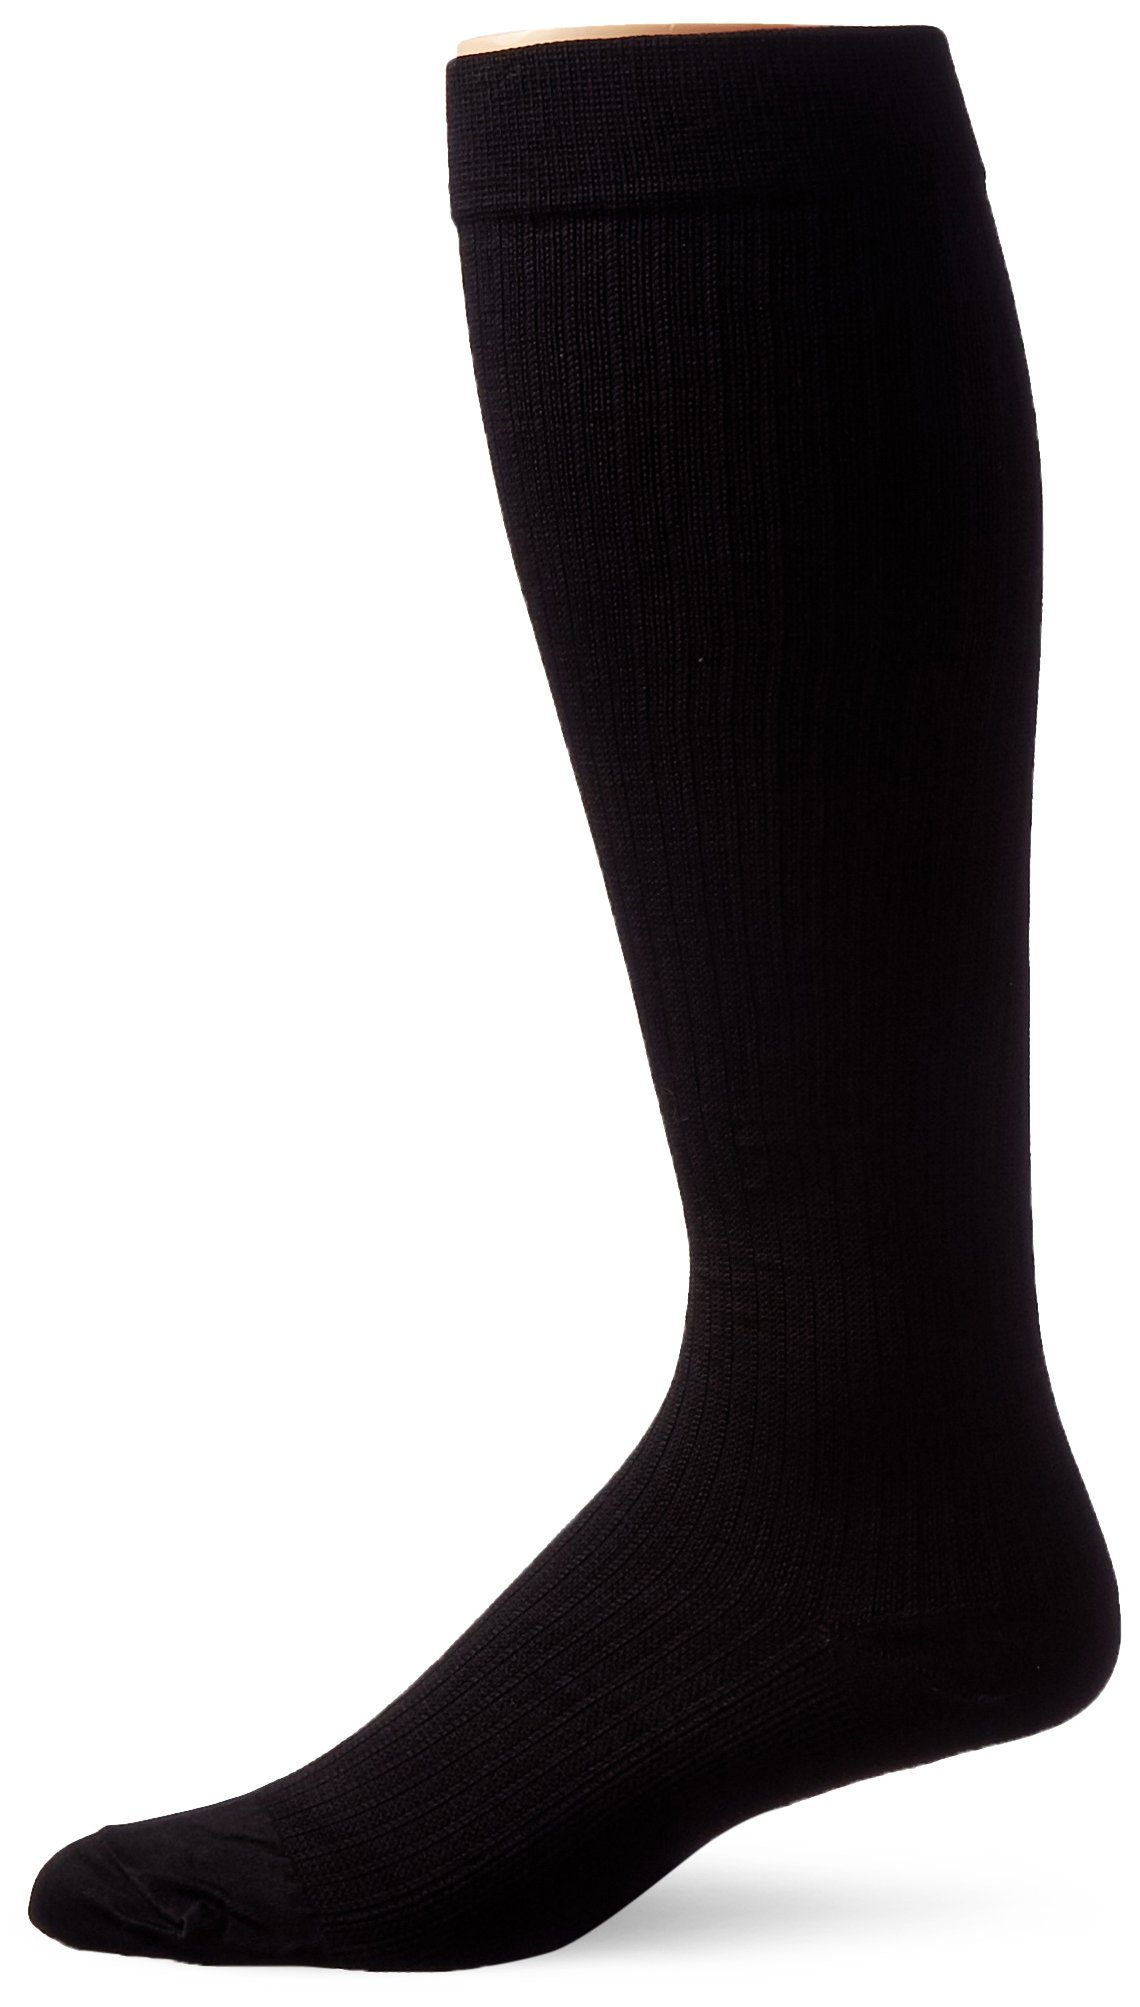 JOBST Men's Dress Knee High 8-15 Closed Toe Socks, Black, Large